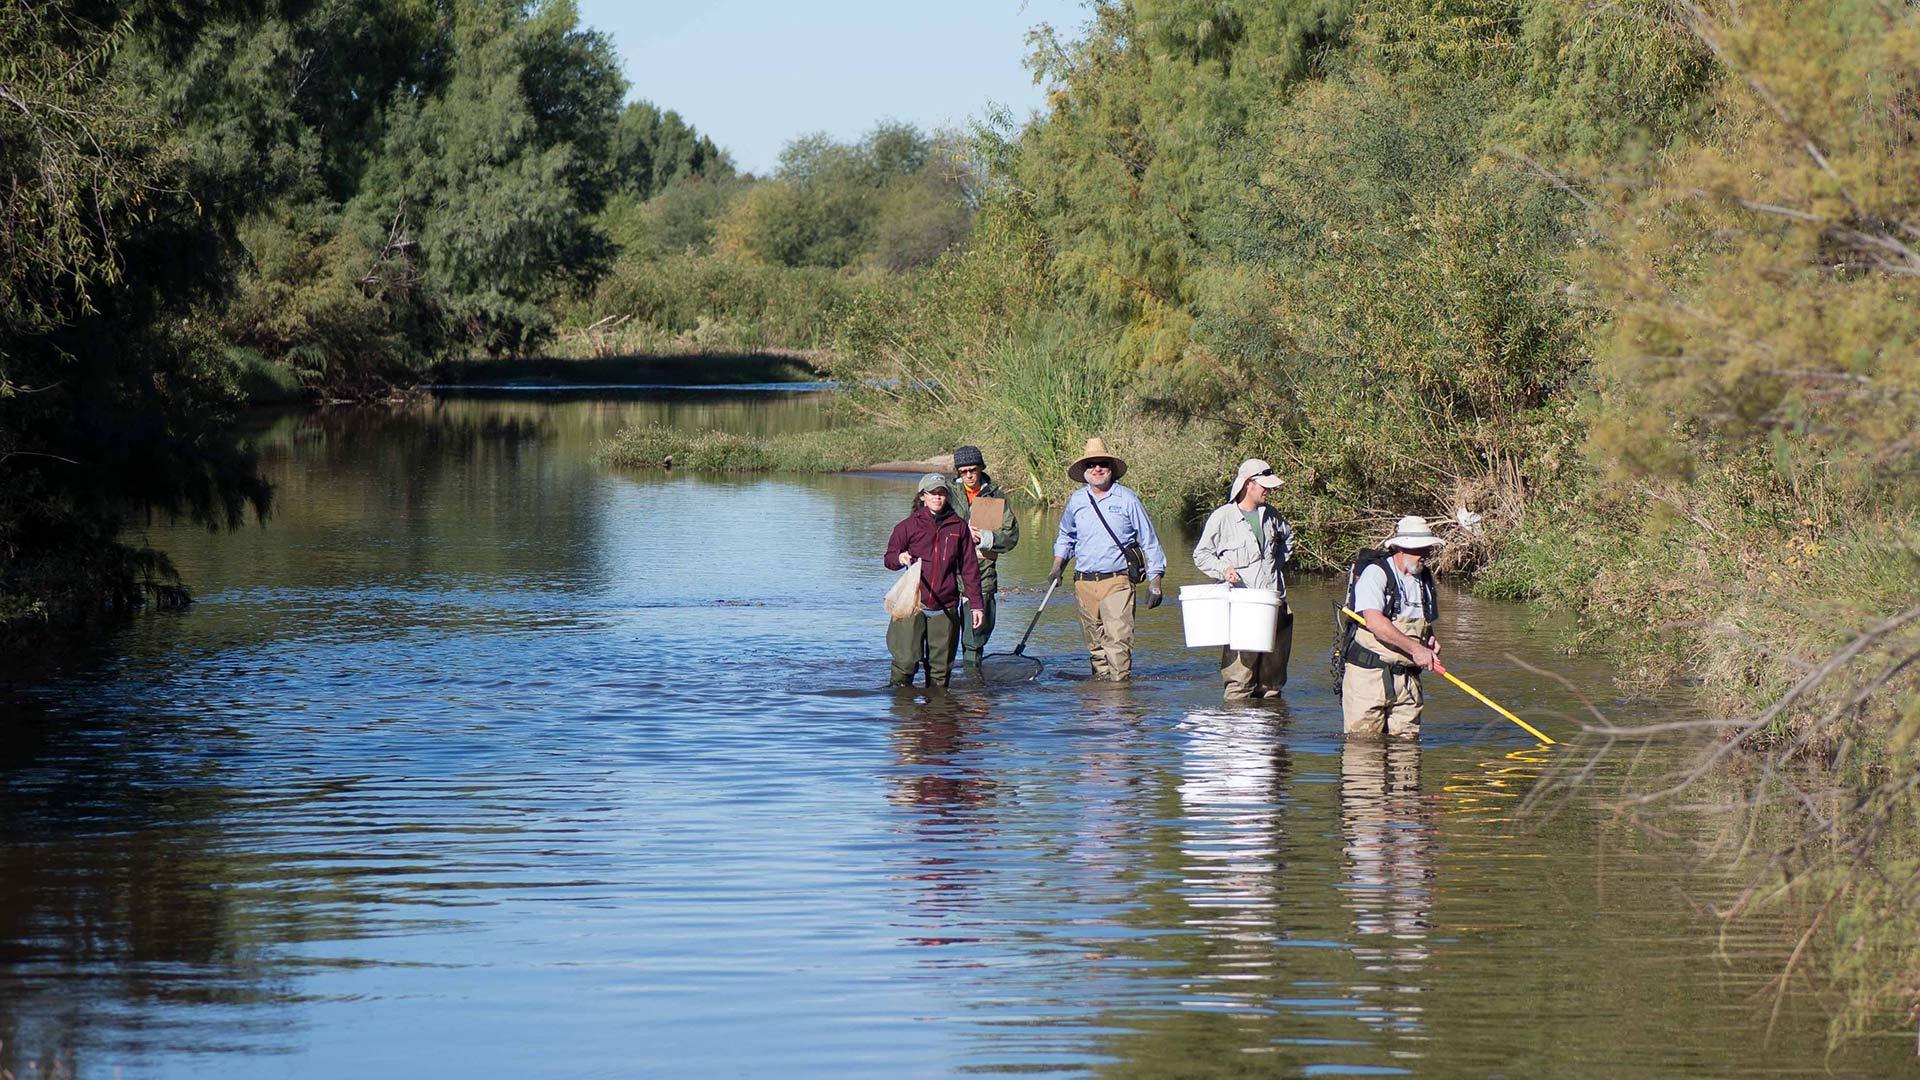 The fish survey team in the Santa Cruz River in Marana, 2015.